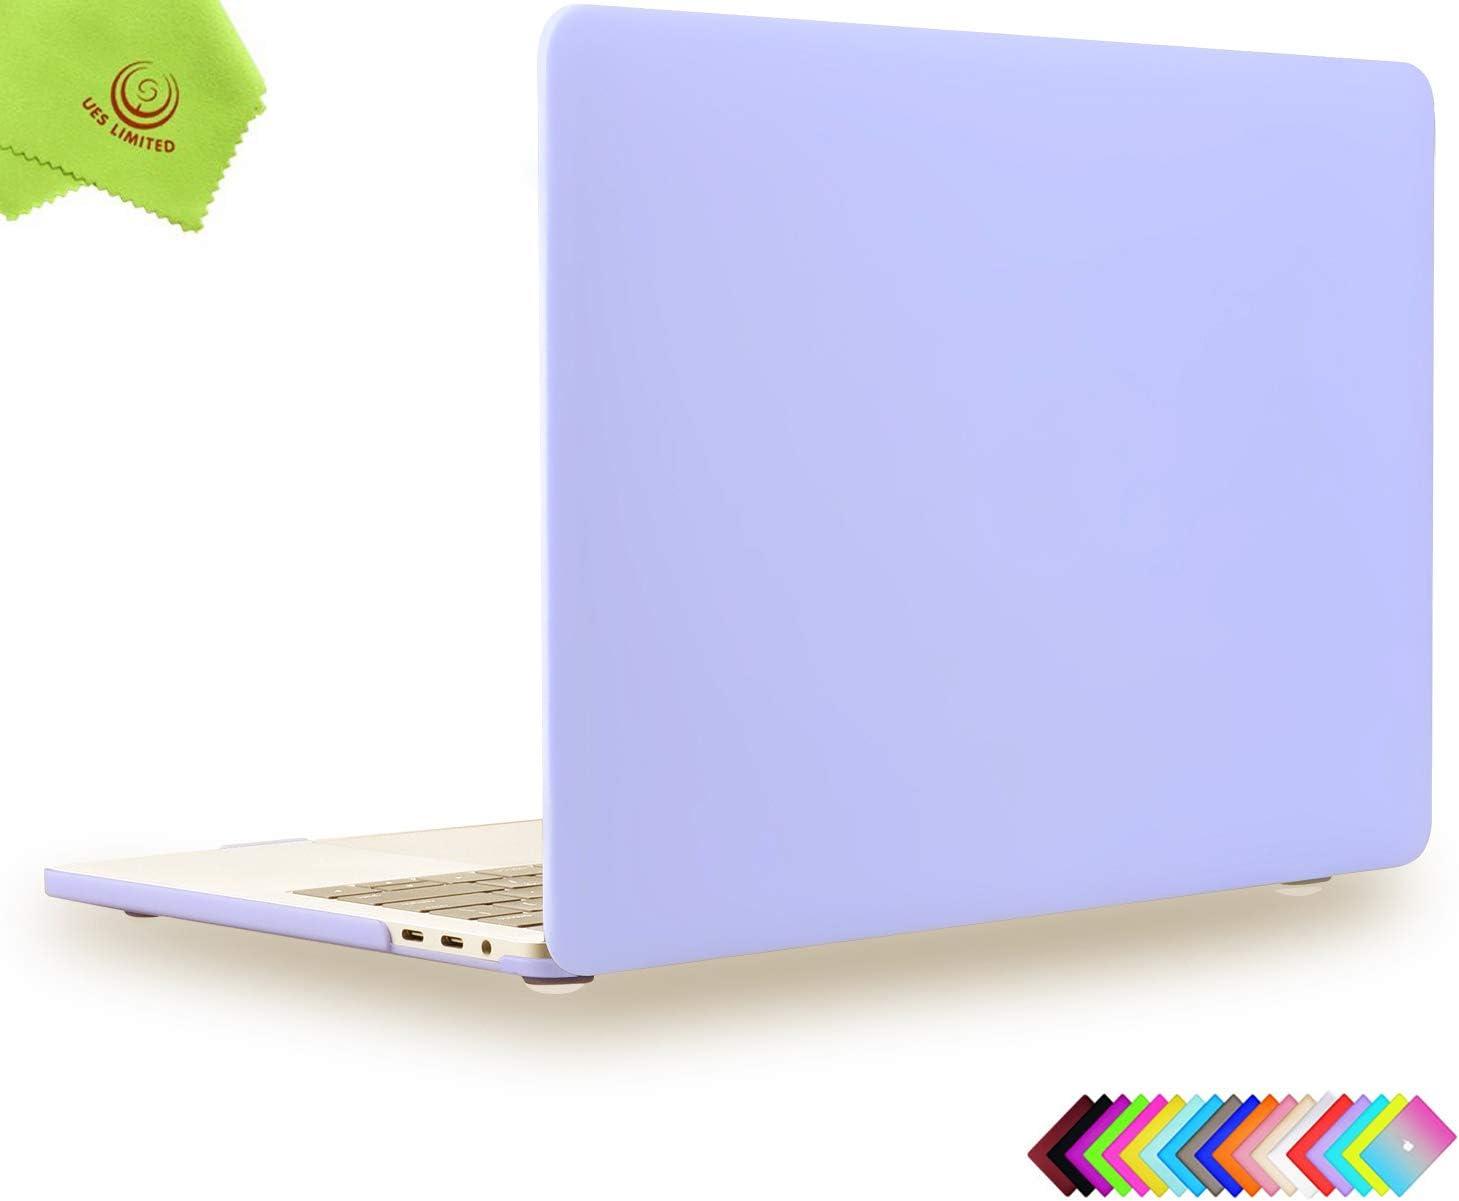 UESWILL MacBook Pro 13 inch Case 2019 2018 2017 2016, Smooth Matte Hard Case for MacBook Pro 13 inch (USB-C), with/Without Touch Bar, Model A2159/A1989/A1706/A1708, Serenity Blue